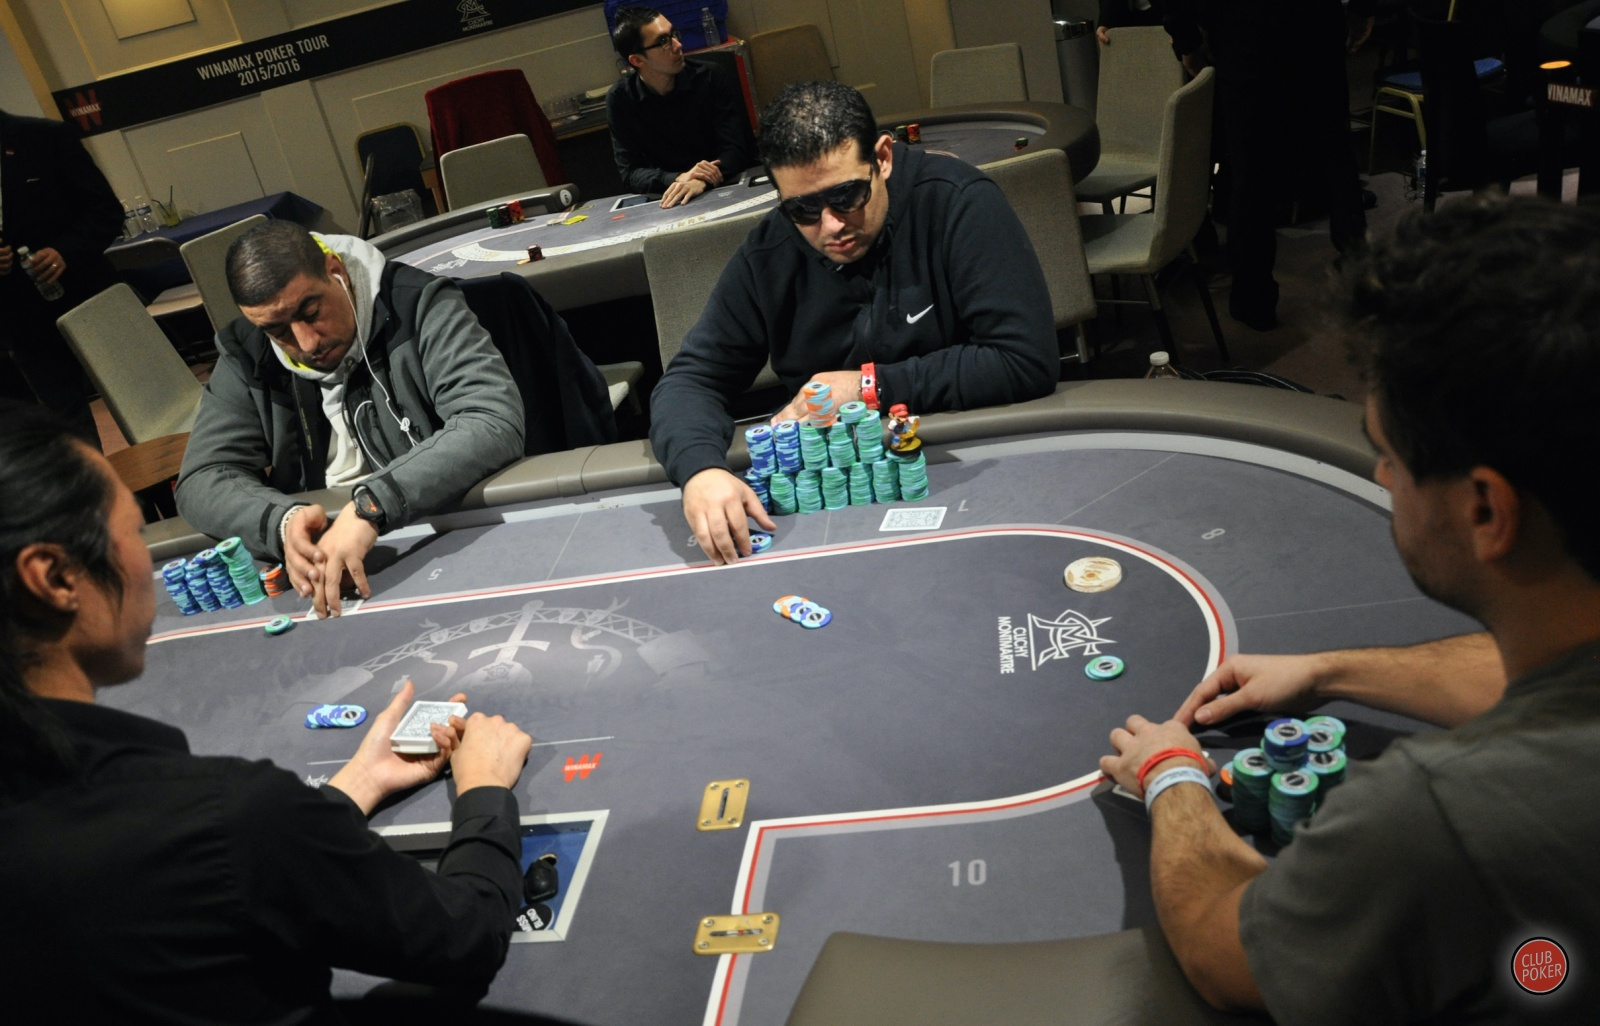 казино азино777 без депозита бонус